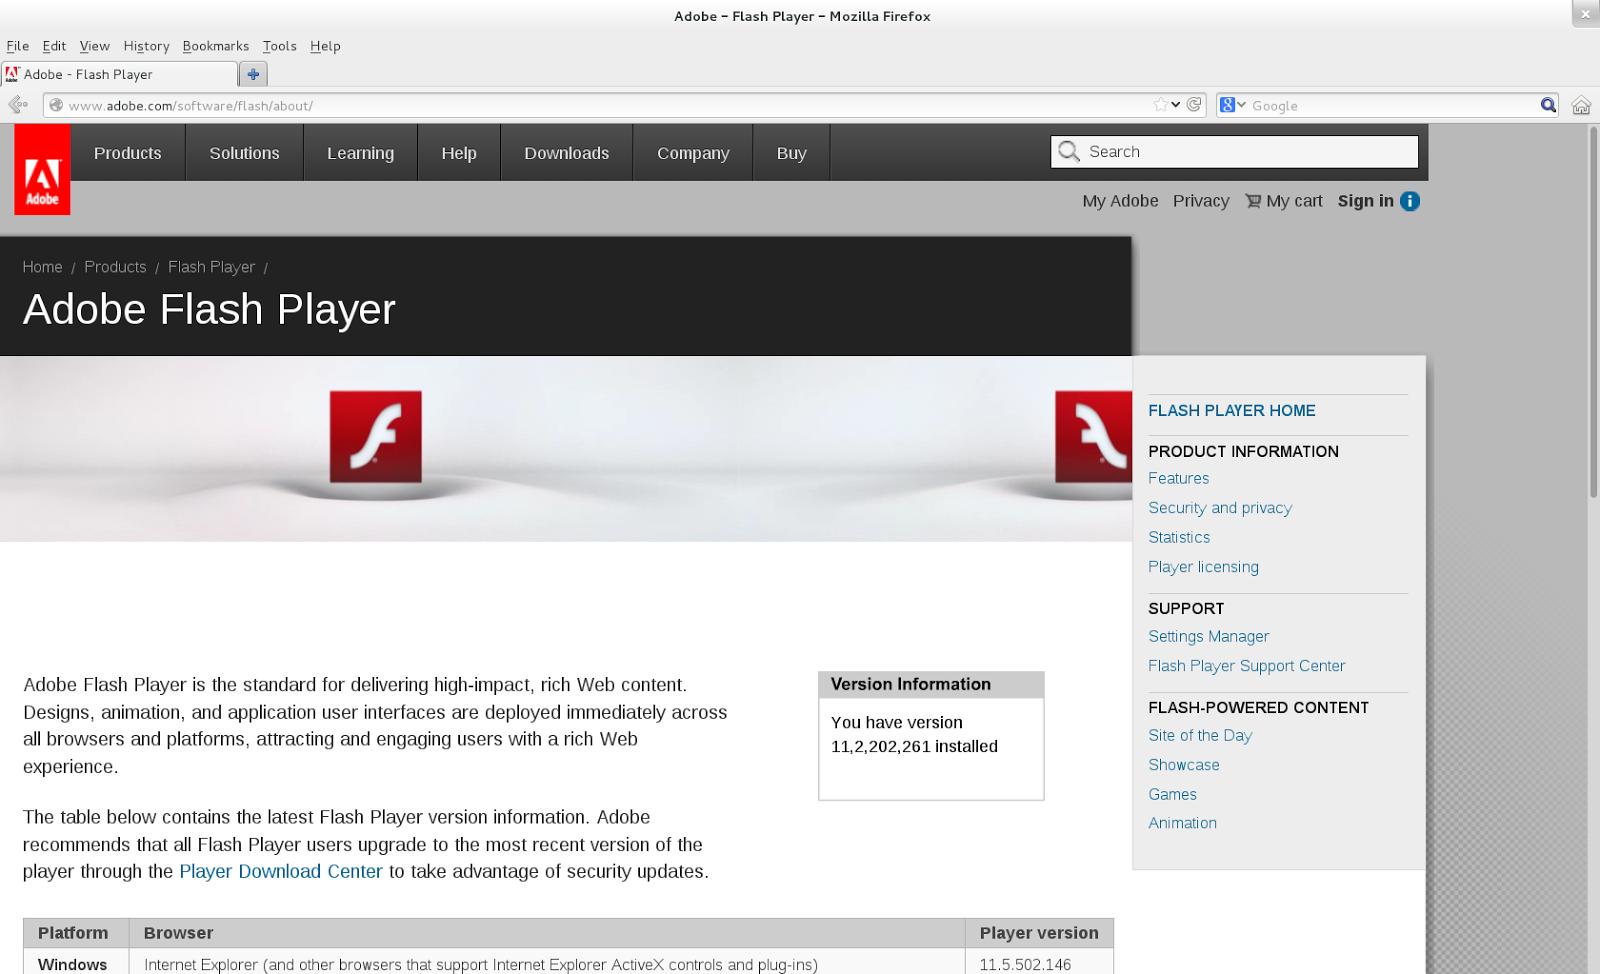 TechnoZeal: Install Adobe Flash Player on Fedora 15, 16, 17, 18, 19, 20